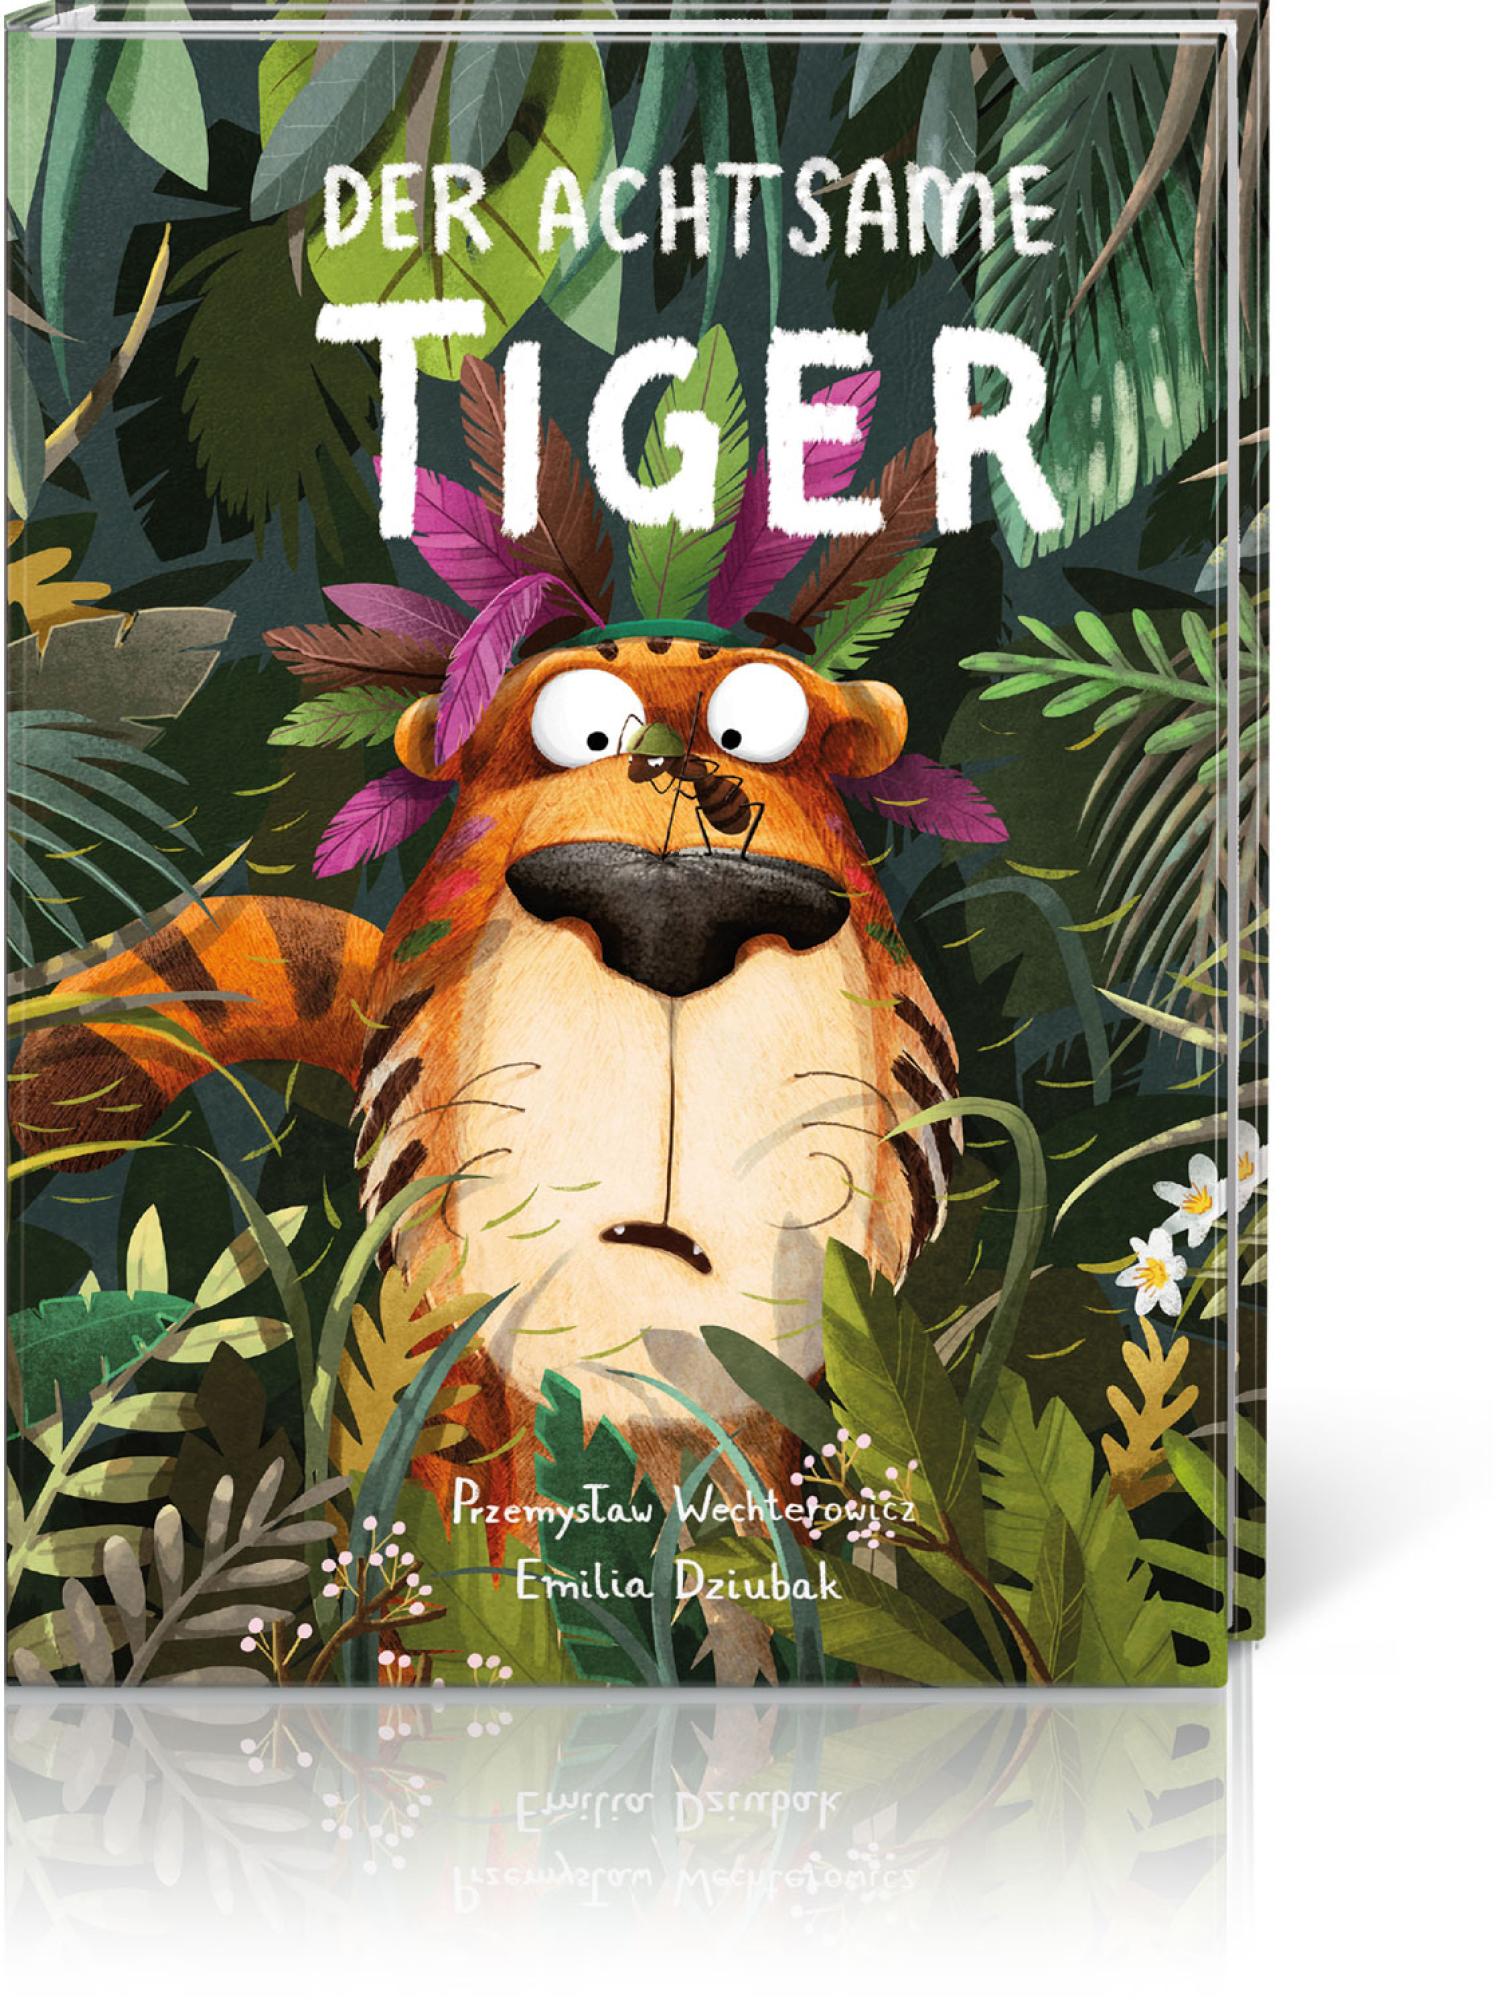 Der achtsame Tiger, Produktbild 1